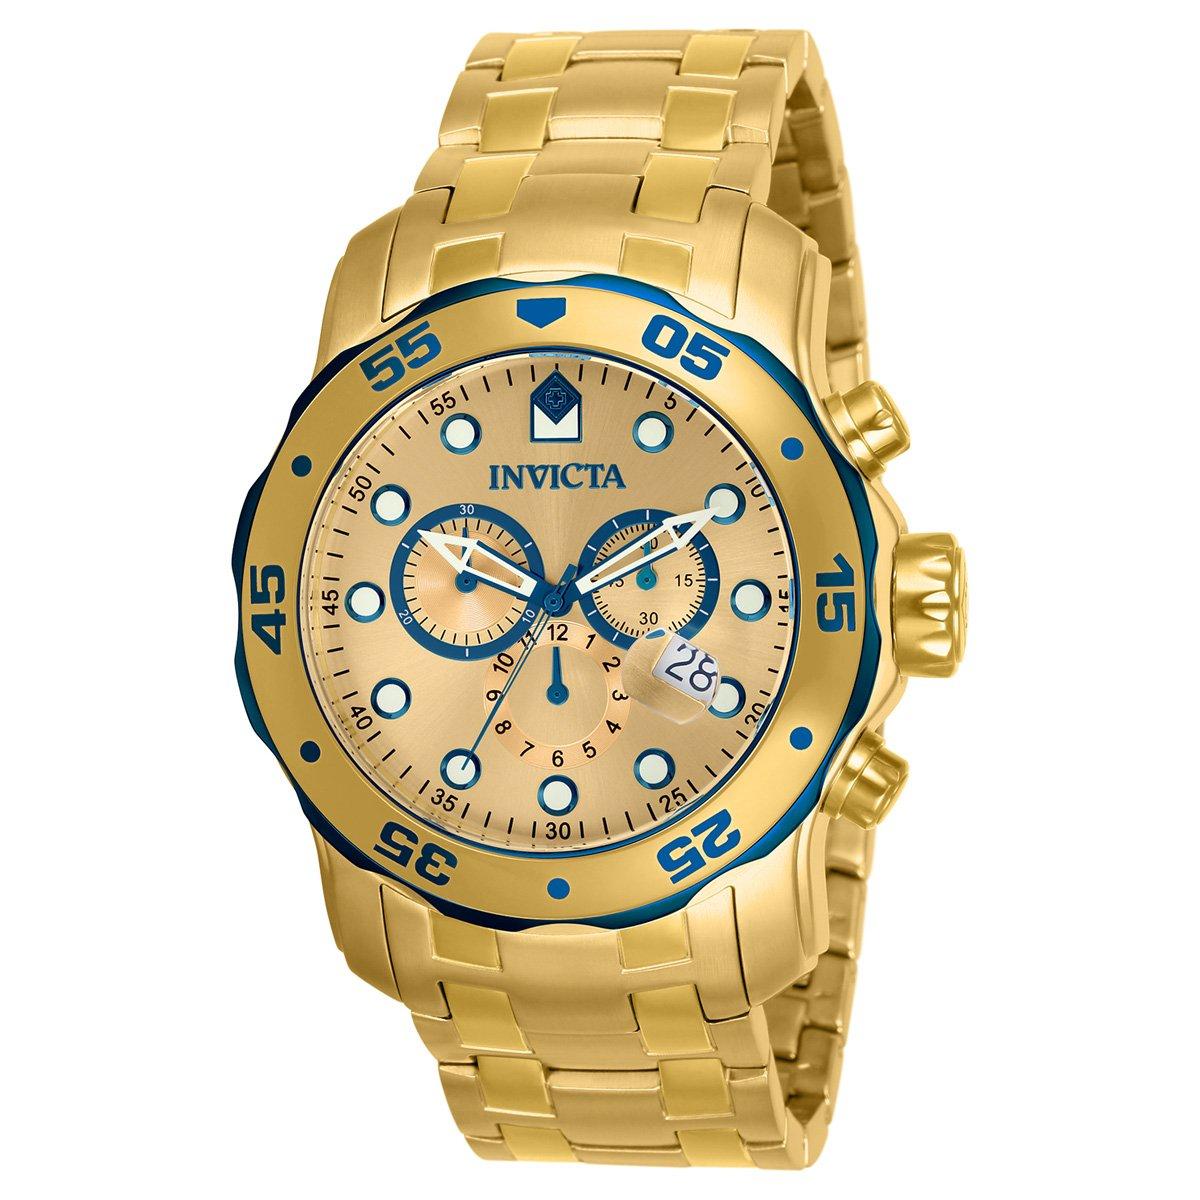 23ee90b9bfa Relógio Invicta Pro Diver-80069 - Dourado - Compre Agora